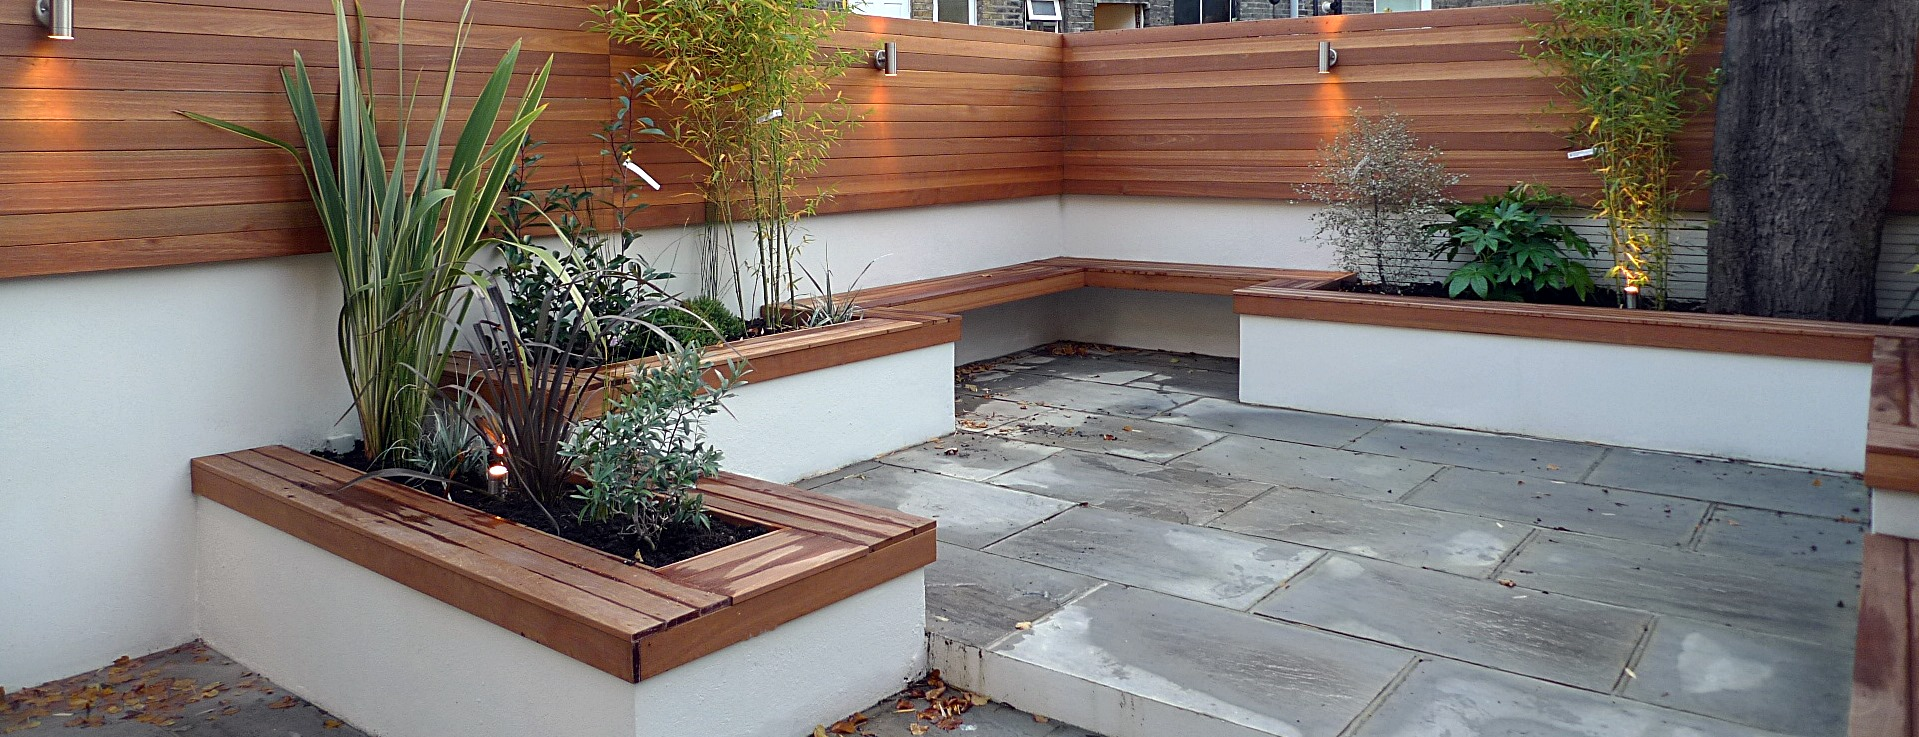 modern london courtyard low maintenance urban outdoor indoor living garden space paving screens planting bench raised beds (10)